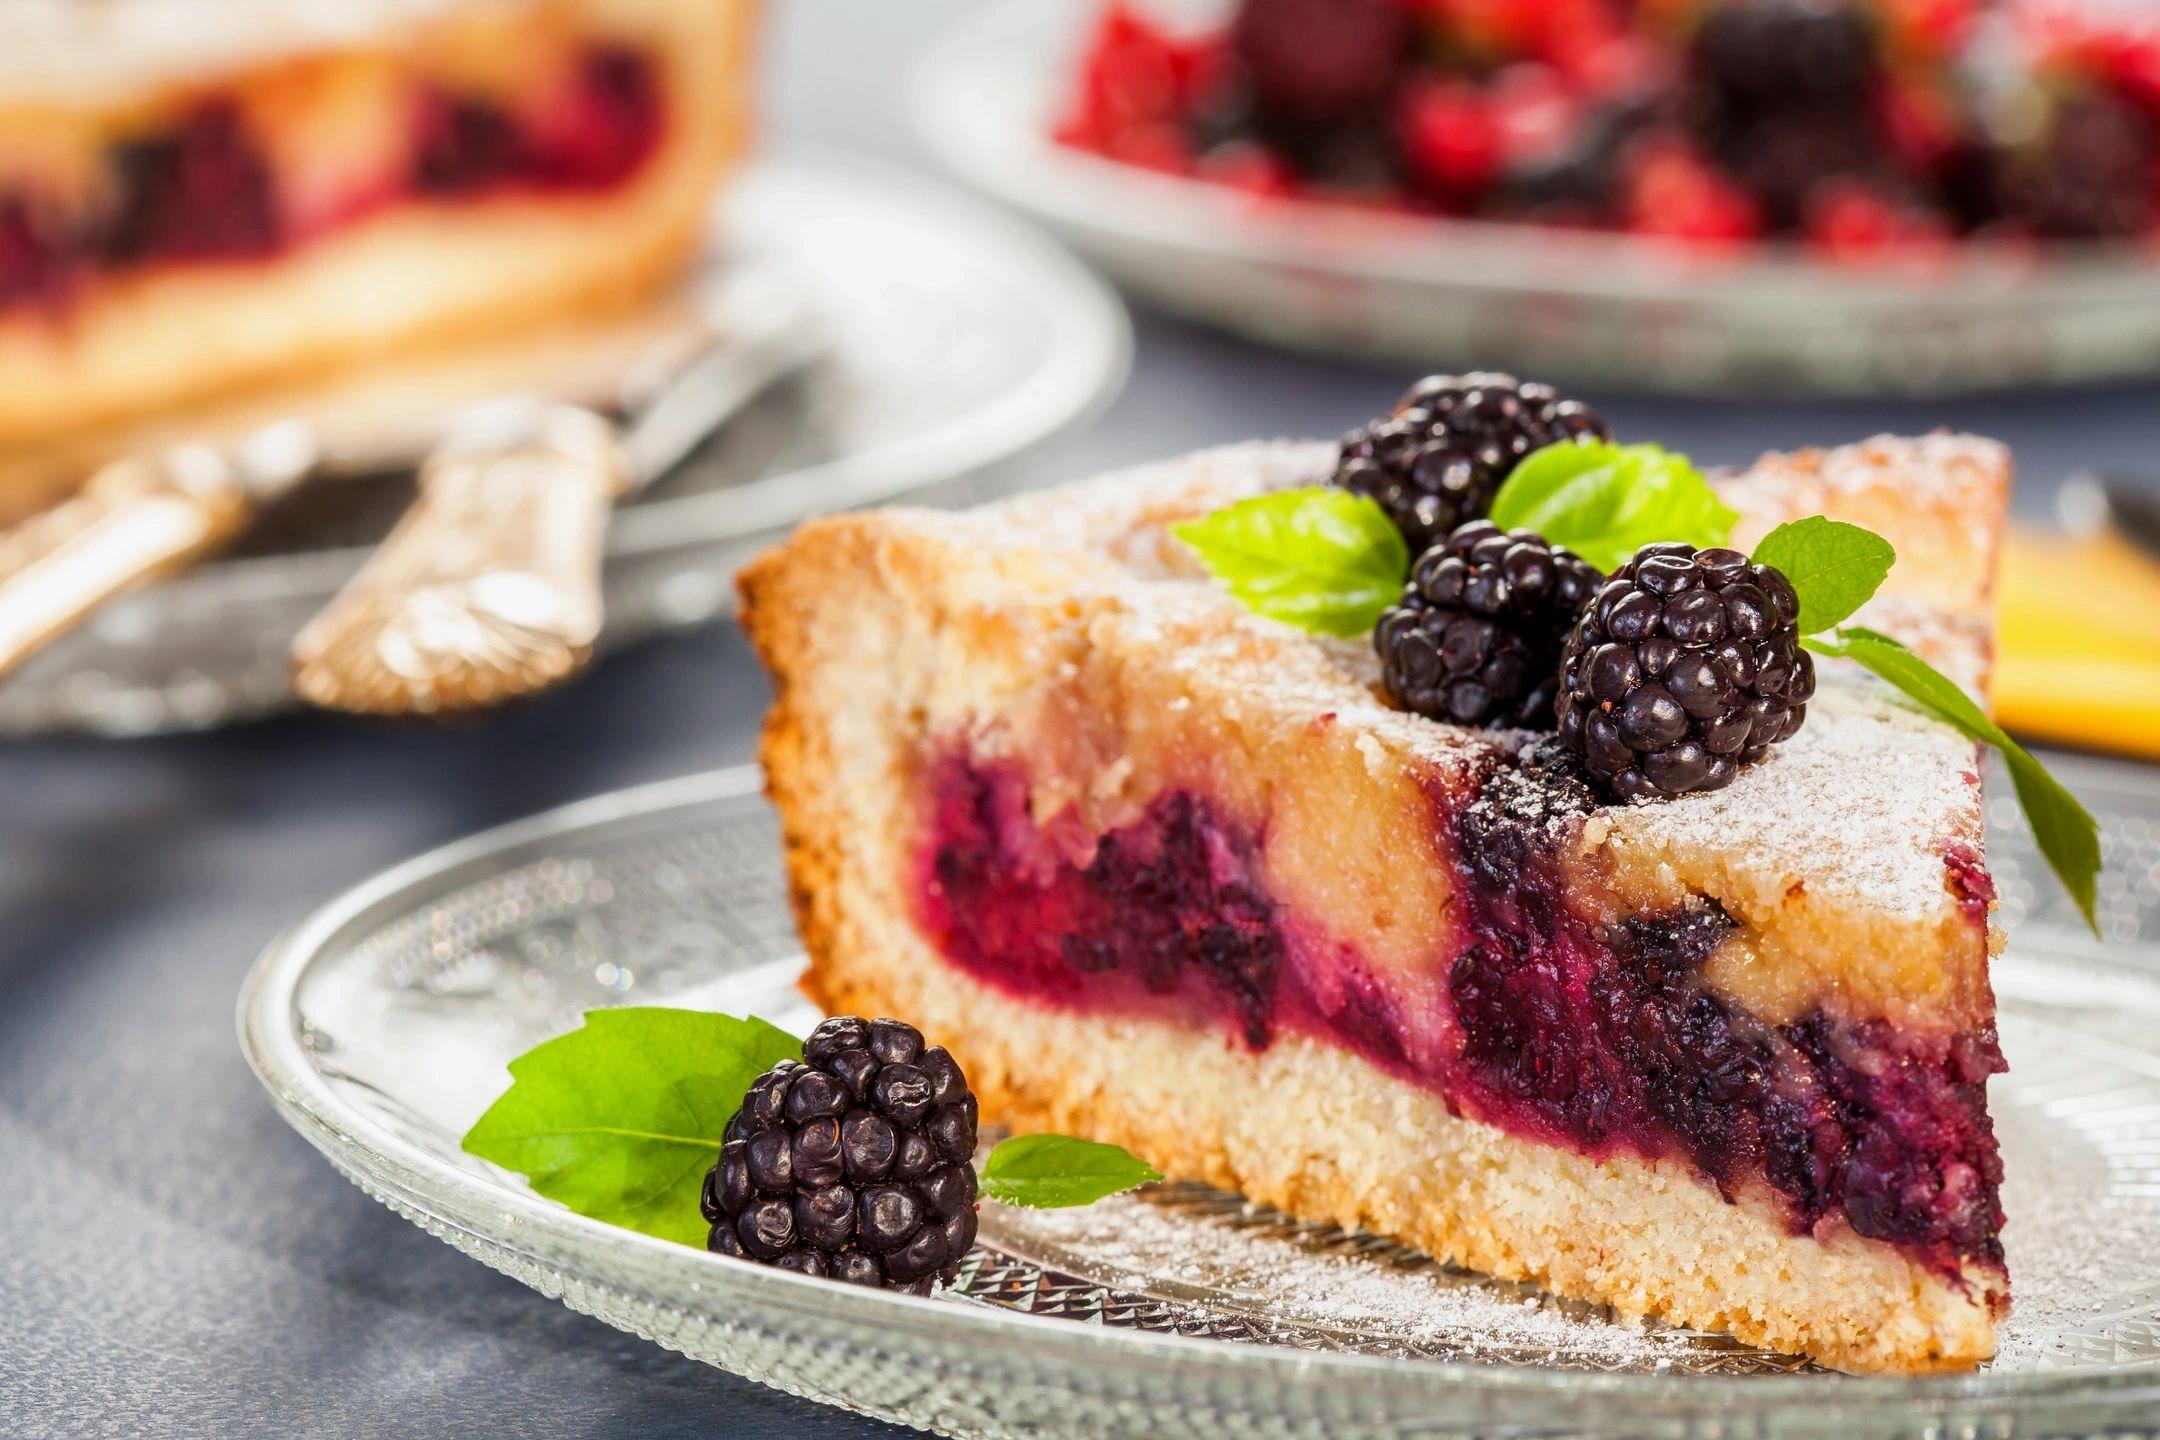 RECIPE – Cherry Pie Crumble Bars